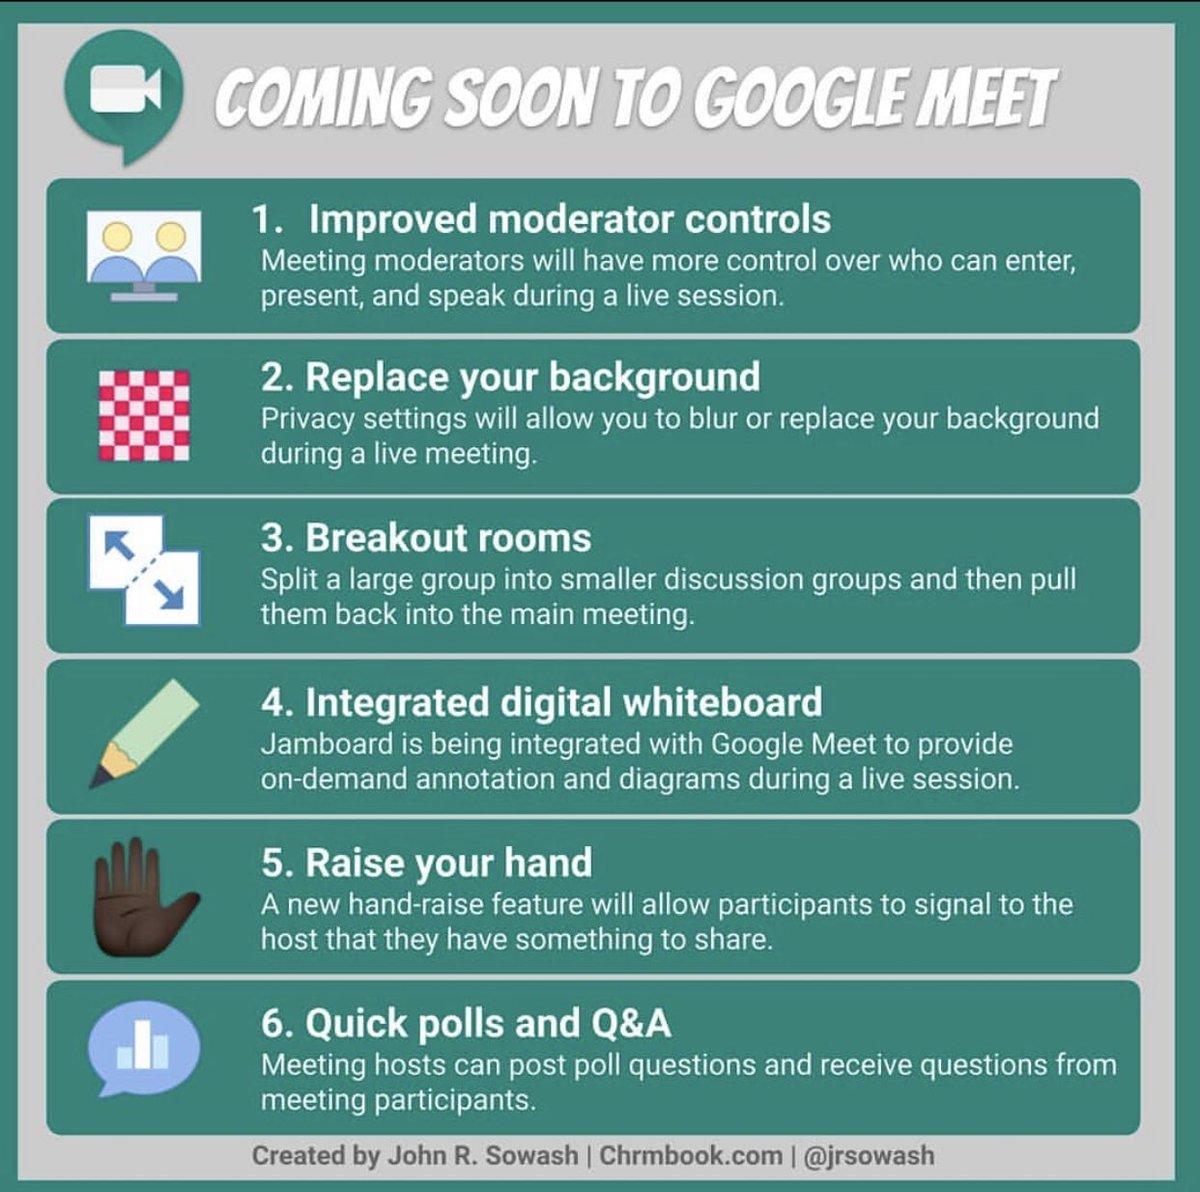 Coming soon to google meet 👍🏼